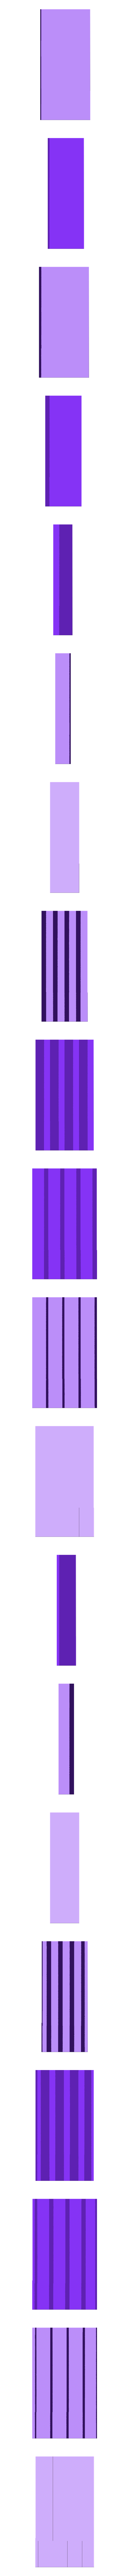 super_vihelmo.stl Download free STL file stairs • 3D printing model, nathanielbarbosa0121